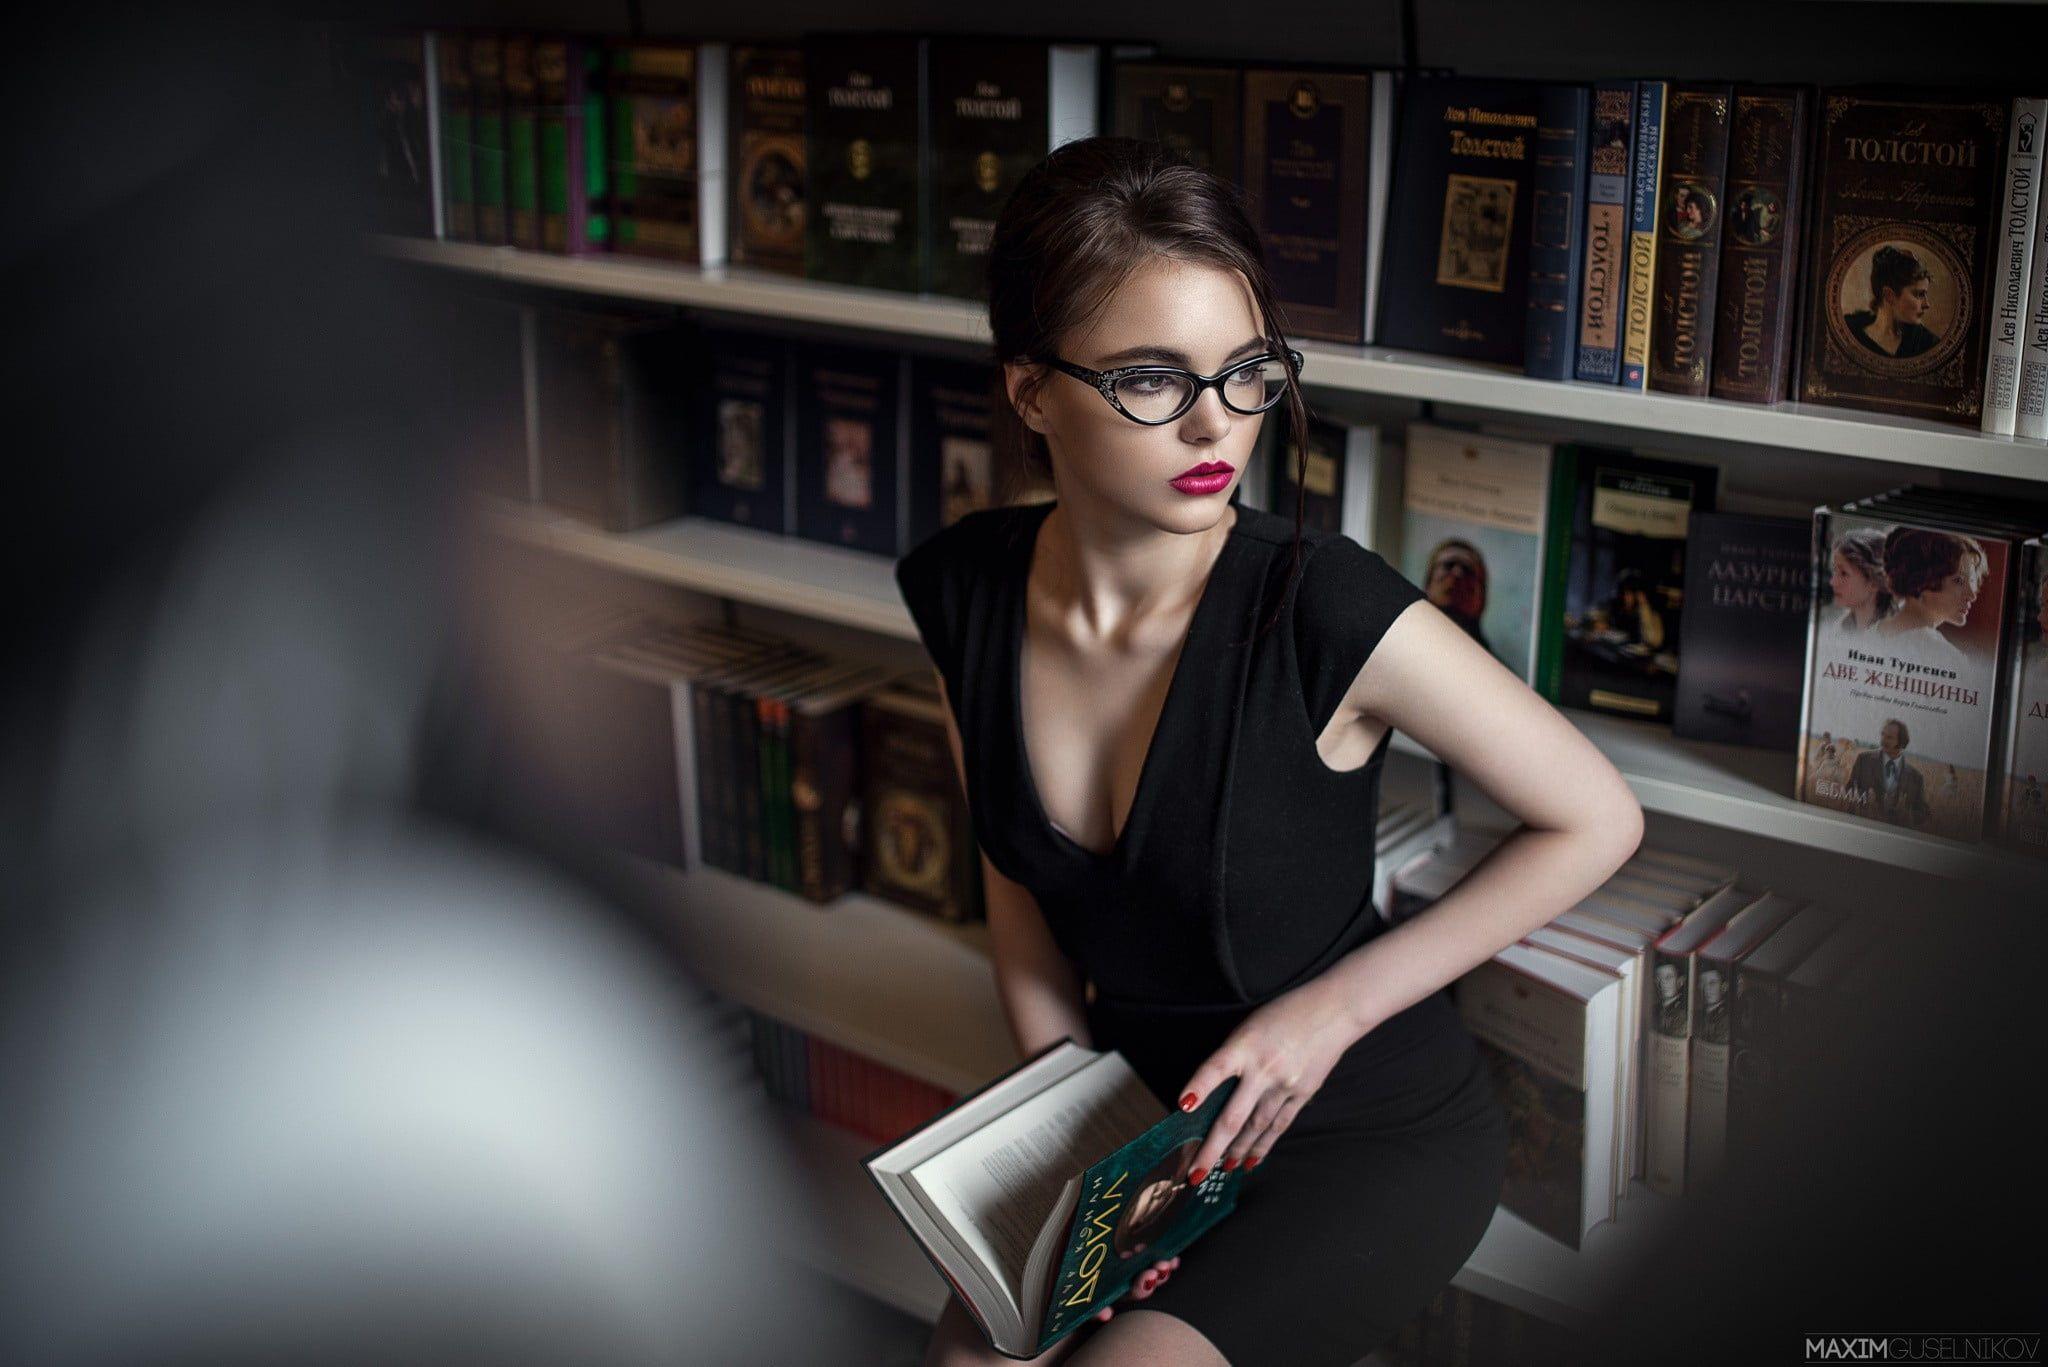 womens black capsleeved dress woman wearing black body con capsleeved dress sitting inside library women with glasses red lipstick Oktyabrina Maximova black dress red nai...